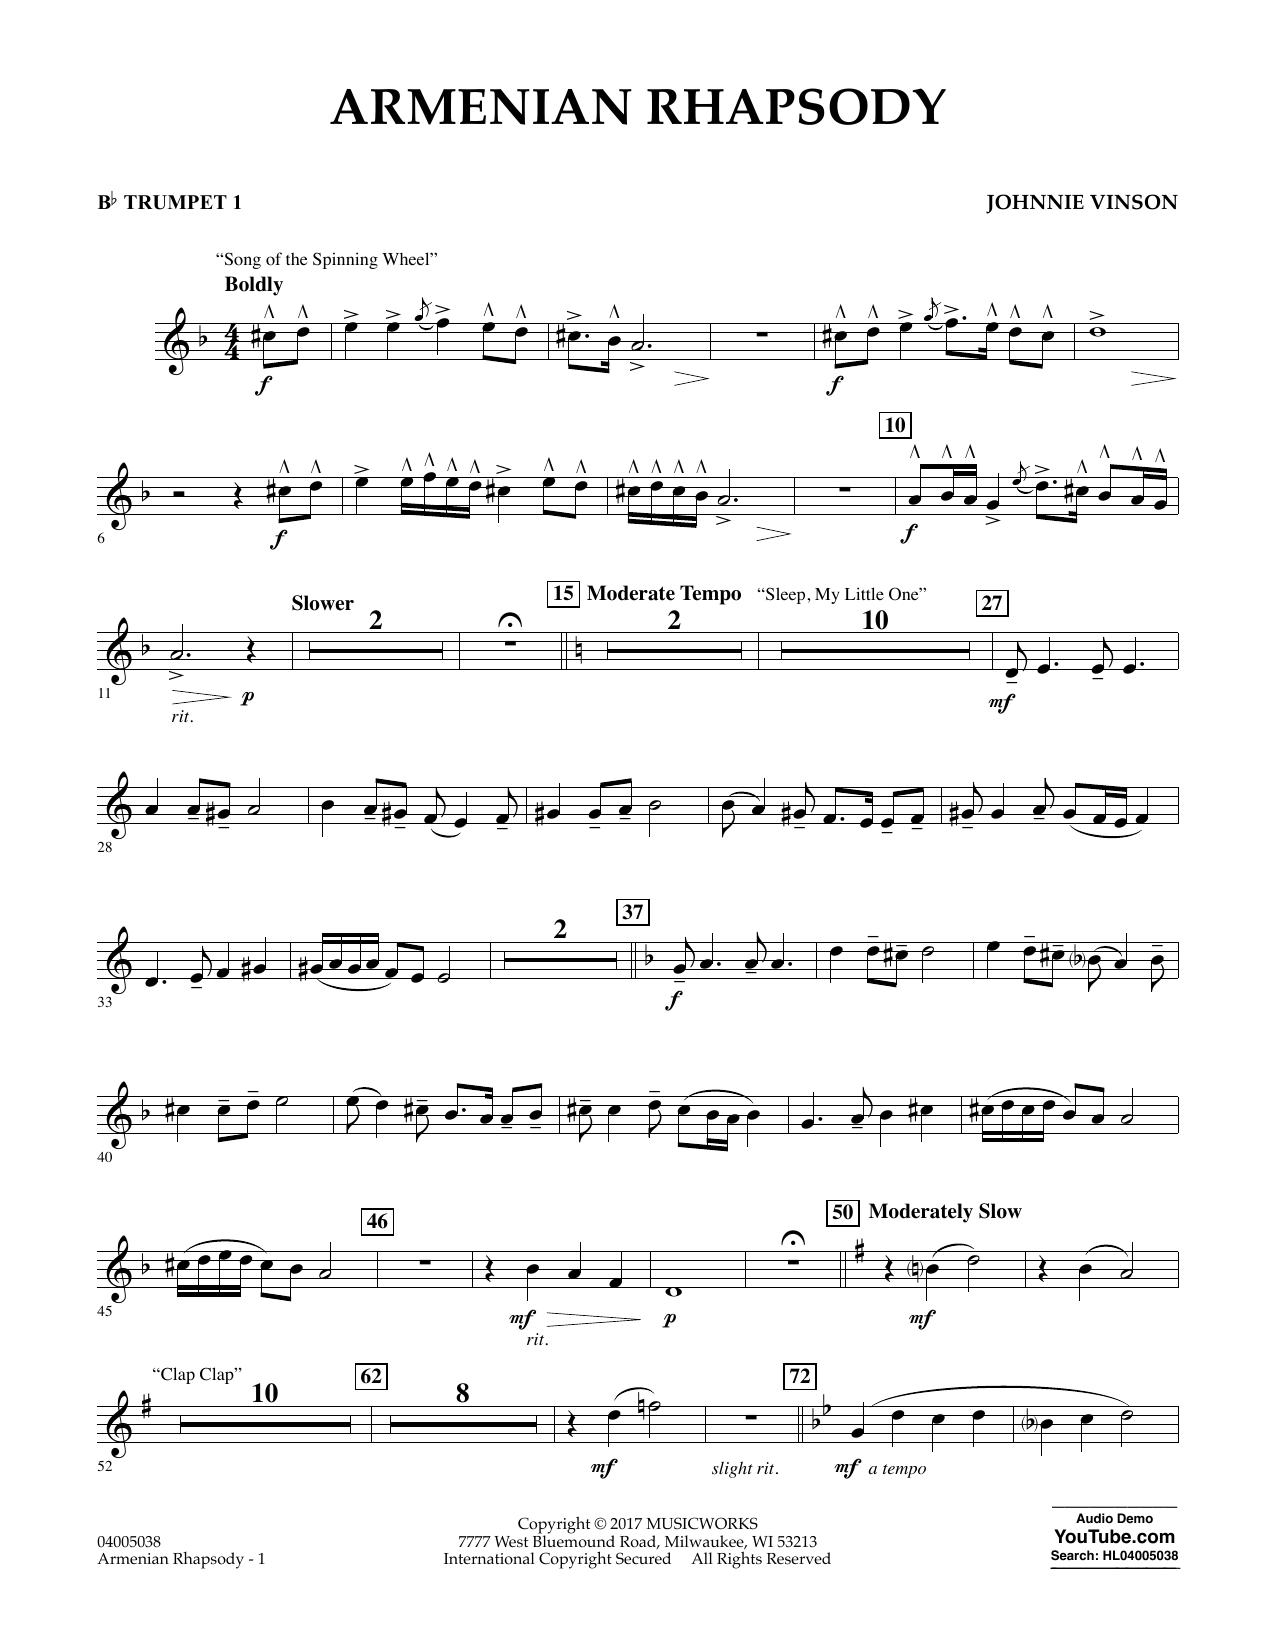 Johnnie Vinson Armenian Rhapsody - Bb Trumpet 1 sheet music notes and chords. Download Printable PDF.